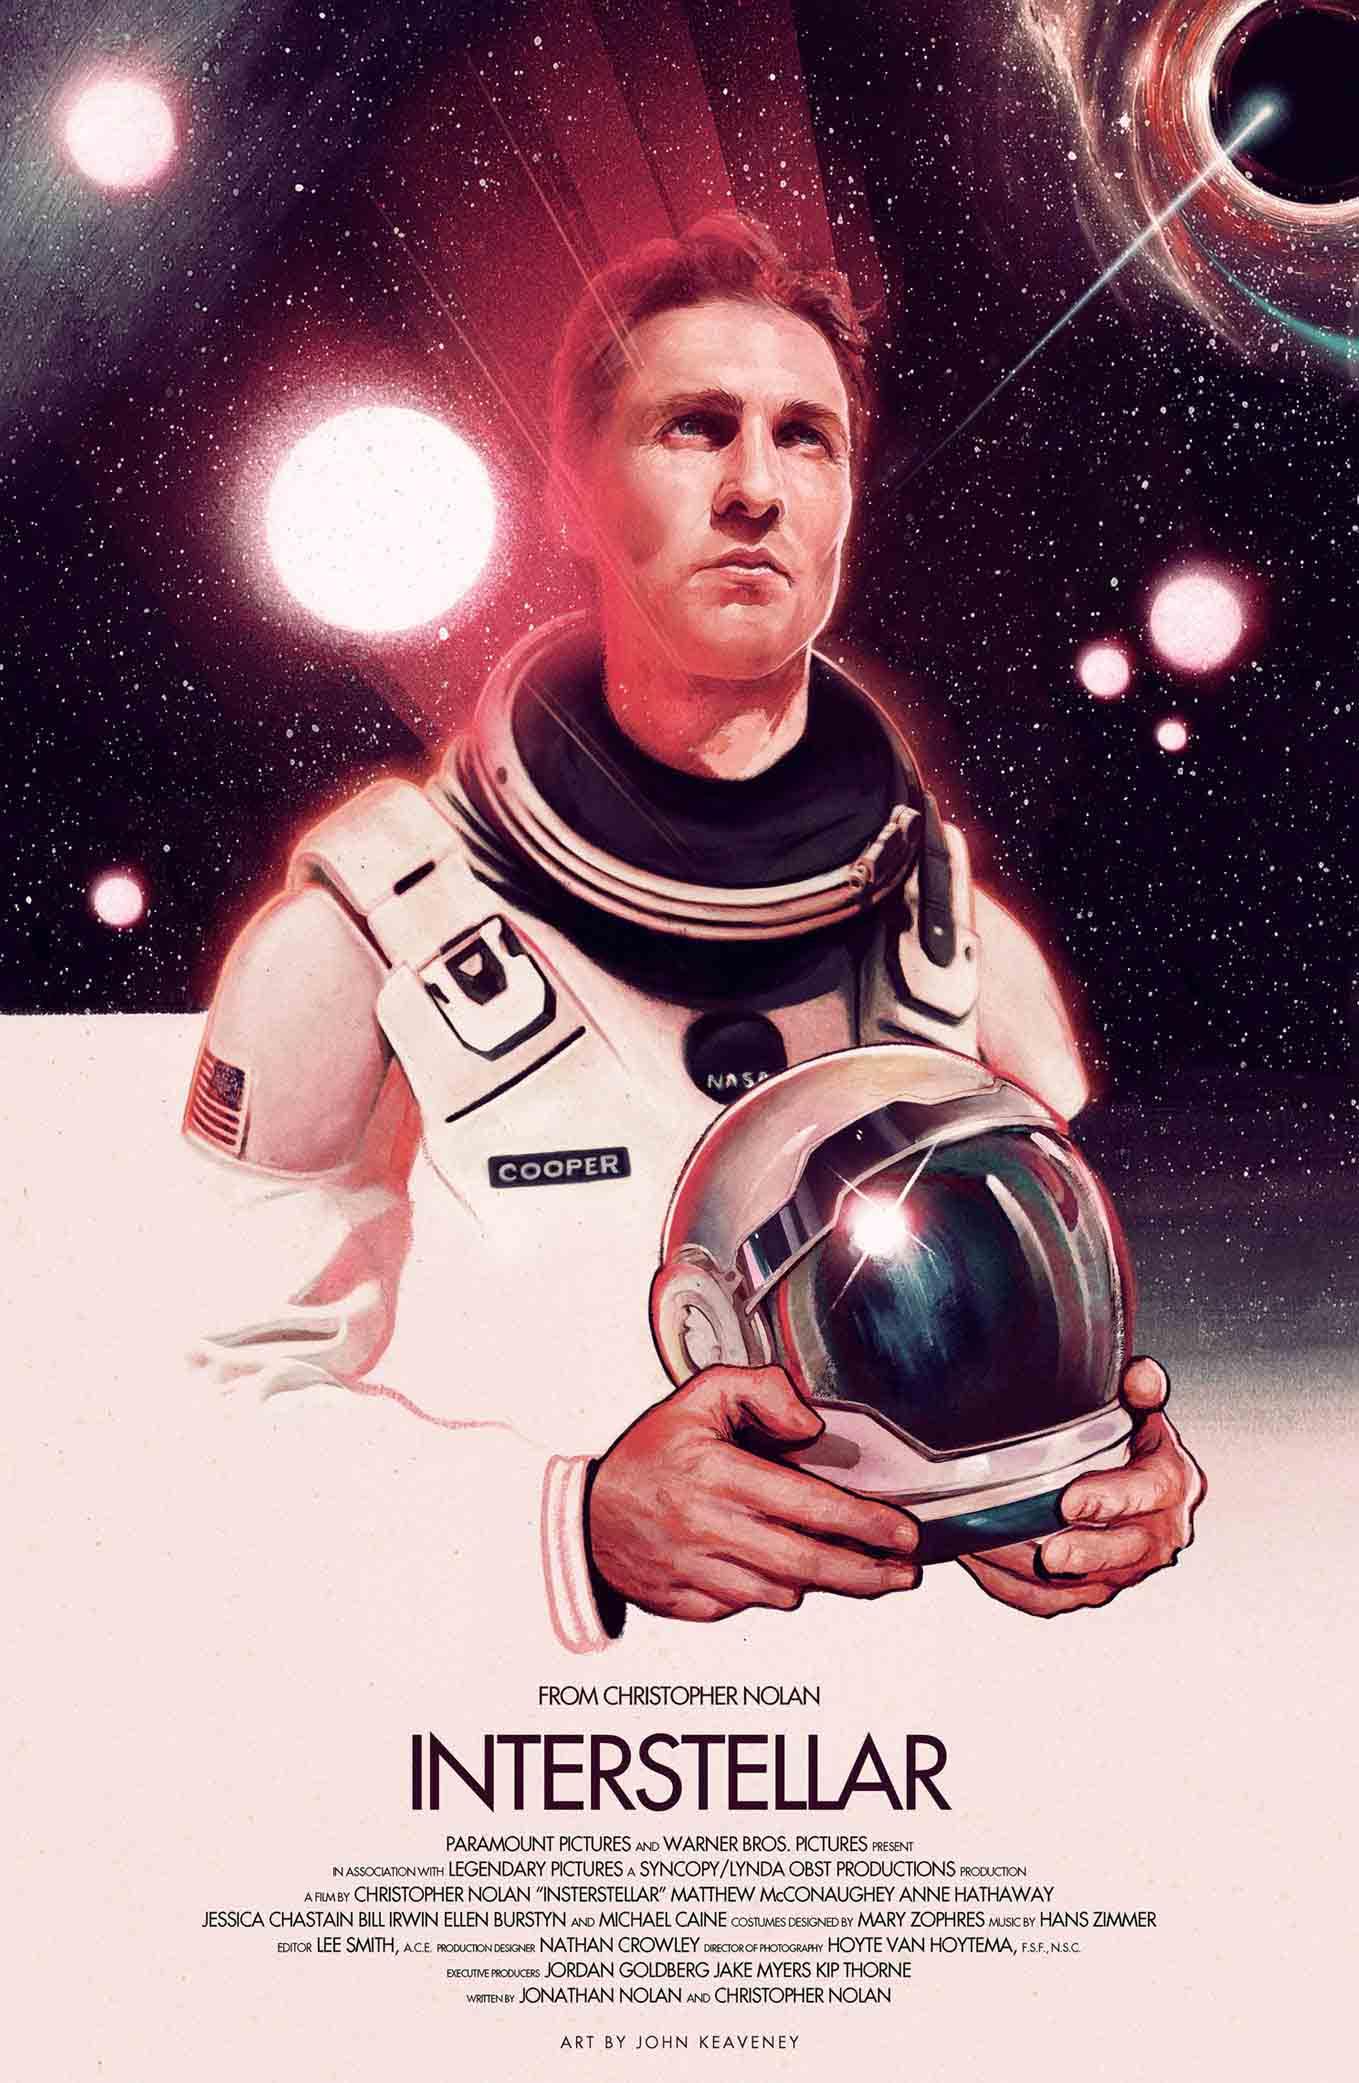 Interstellar Poster Alternative colour #Art By John Keaveney low res.jpg